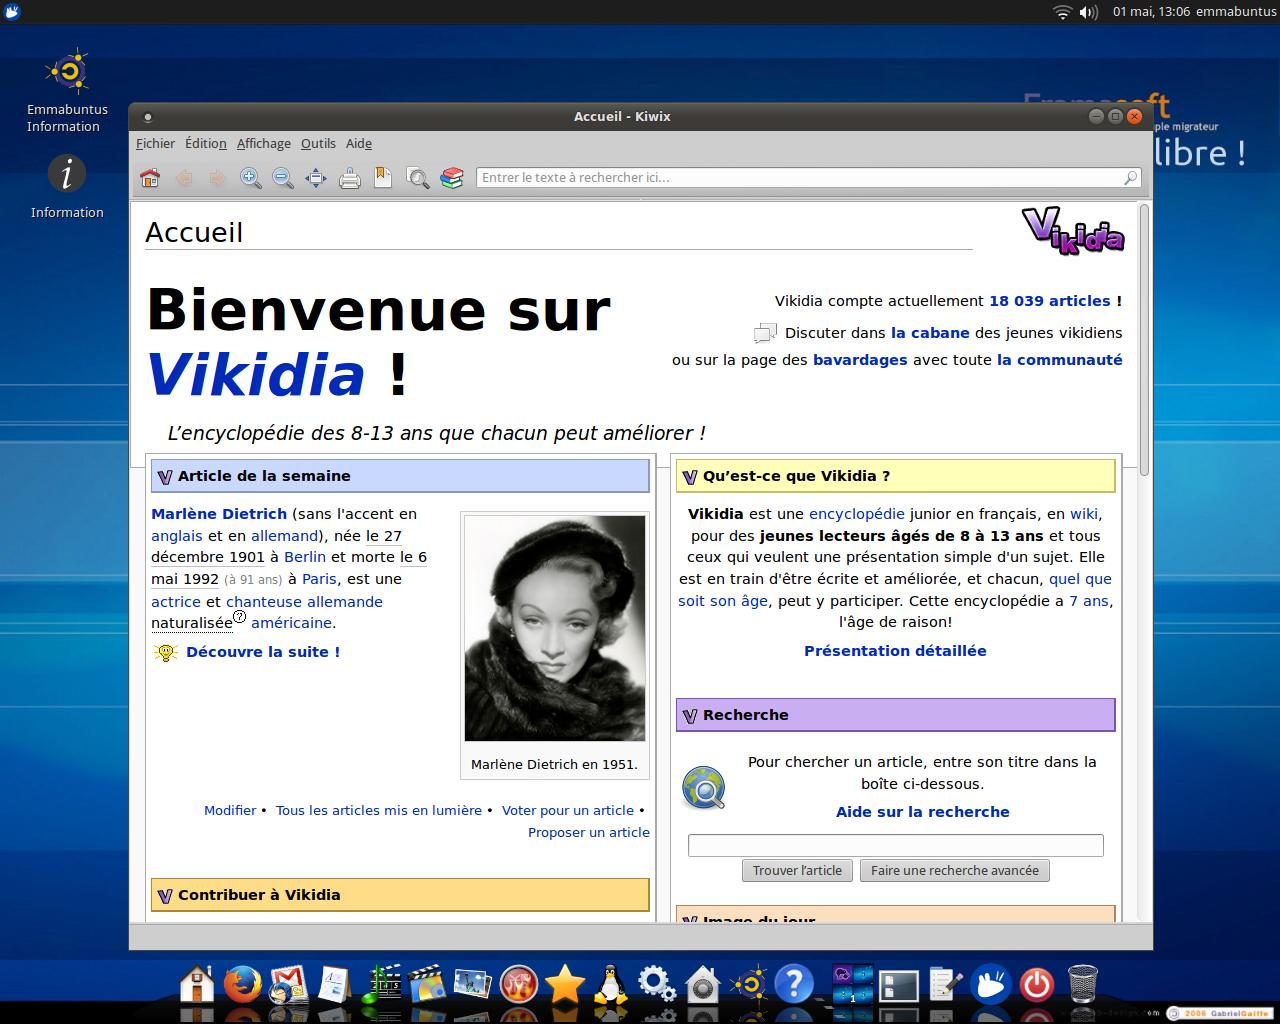 Nom : 36-Kiwix_accueil_vikidia.png Affichages : 635 Taille : 435,7 Ko